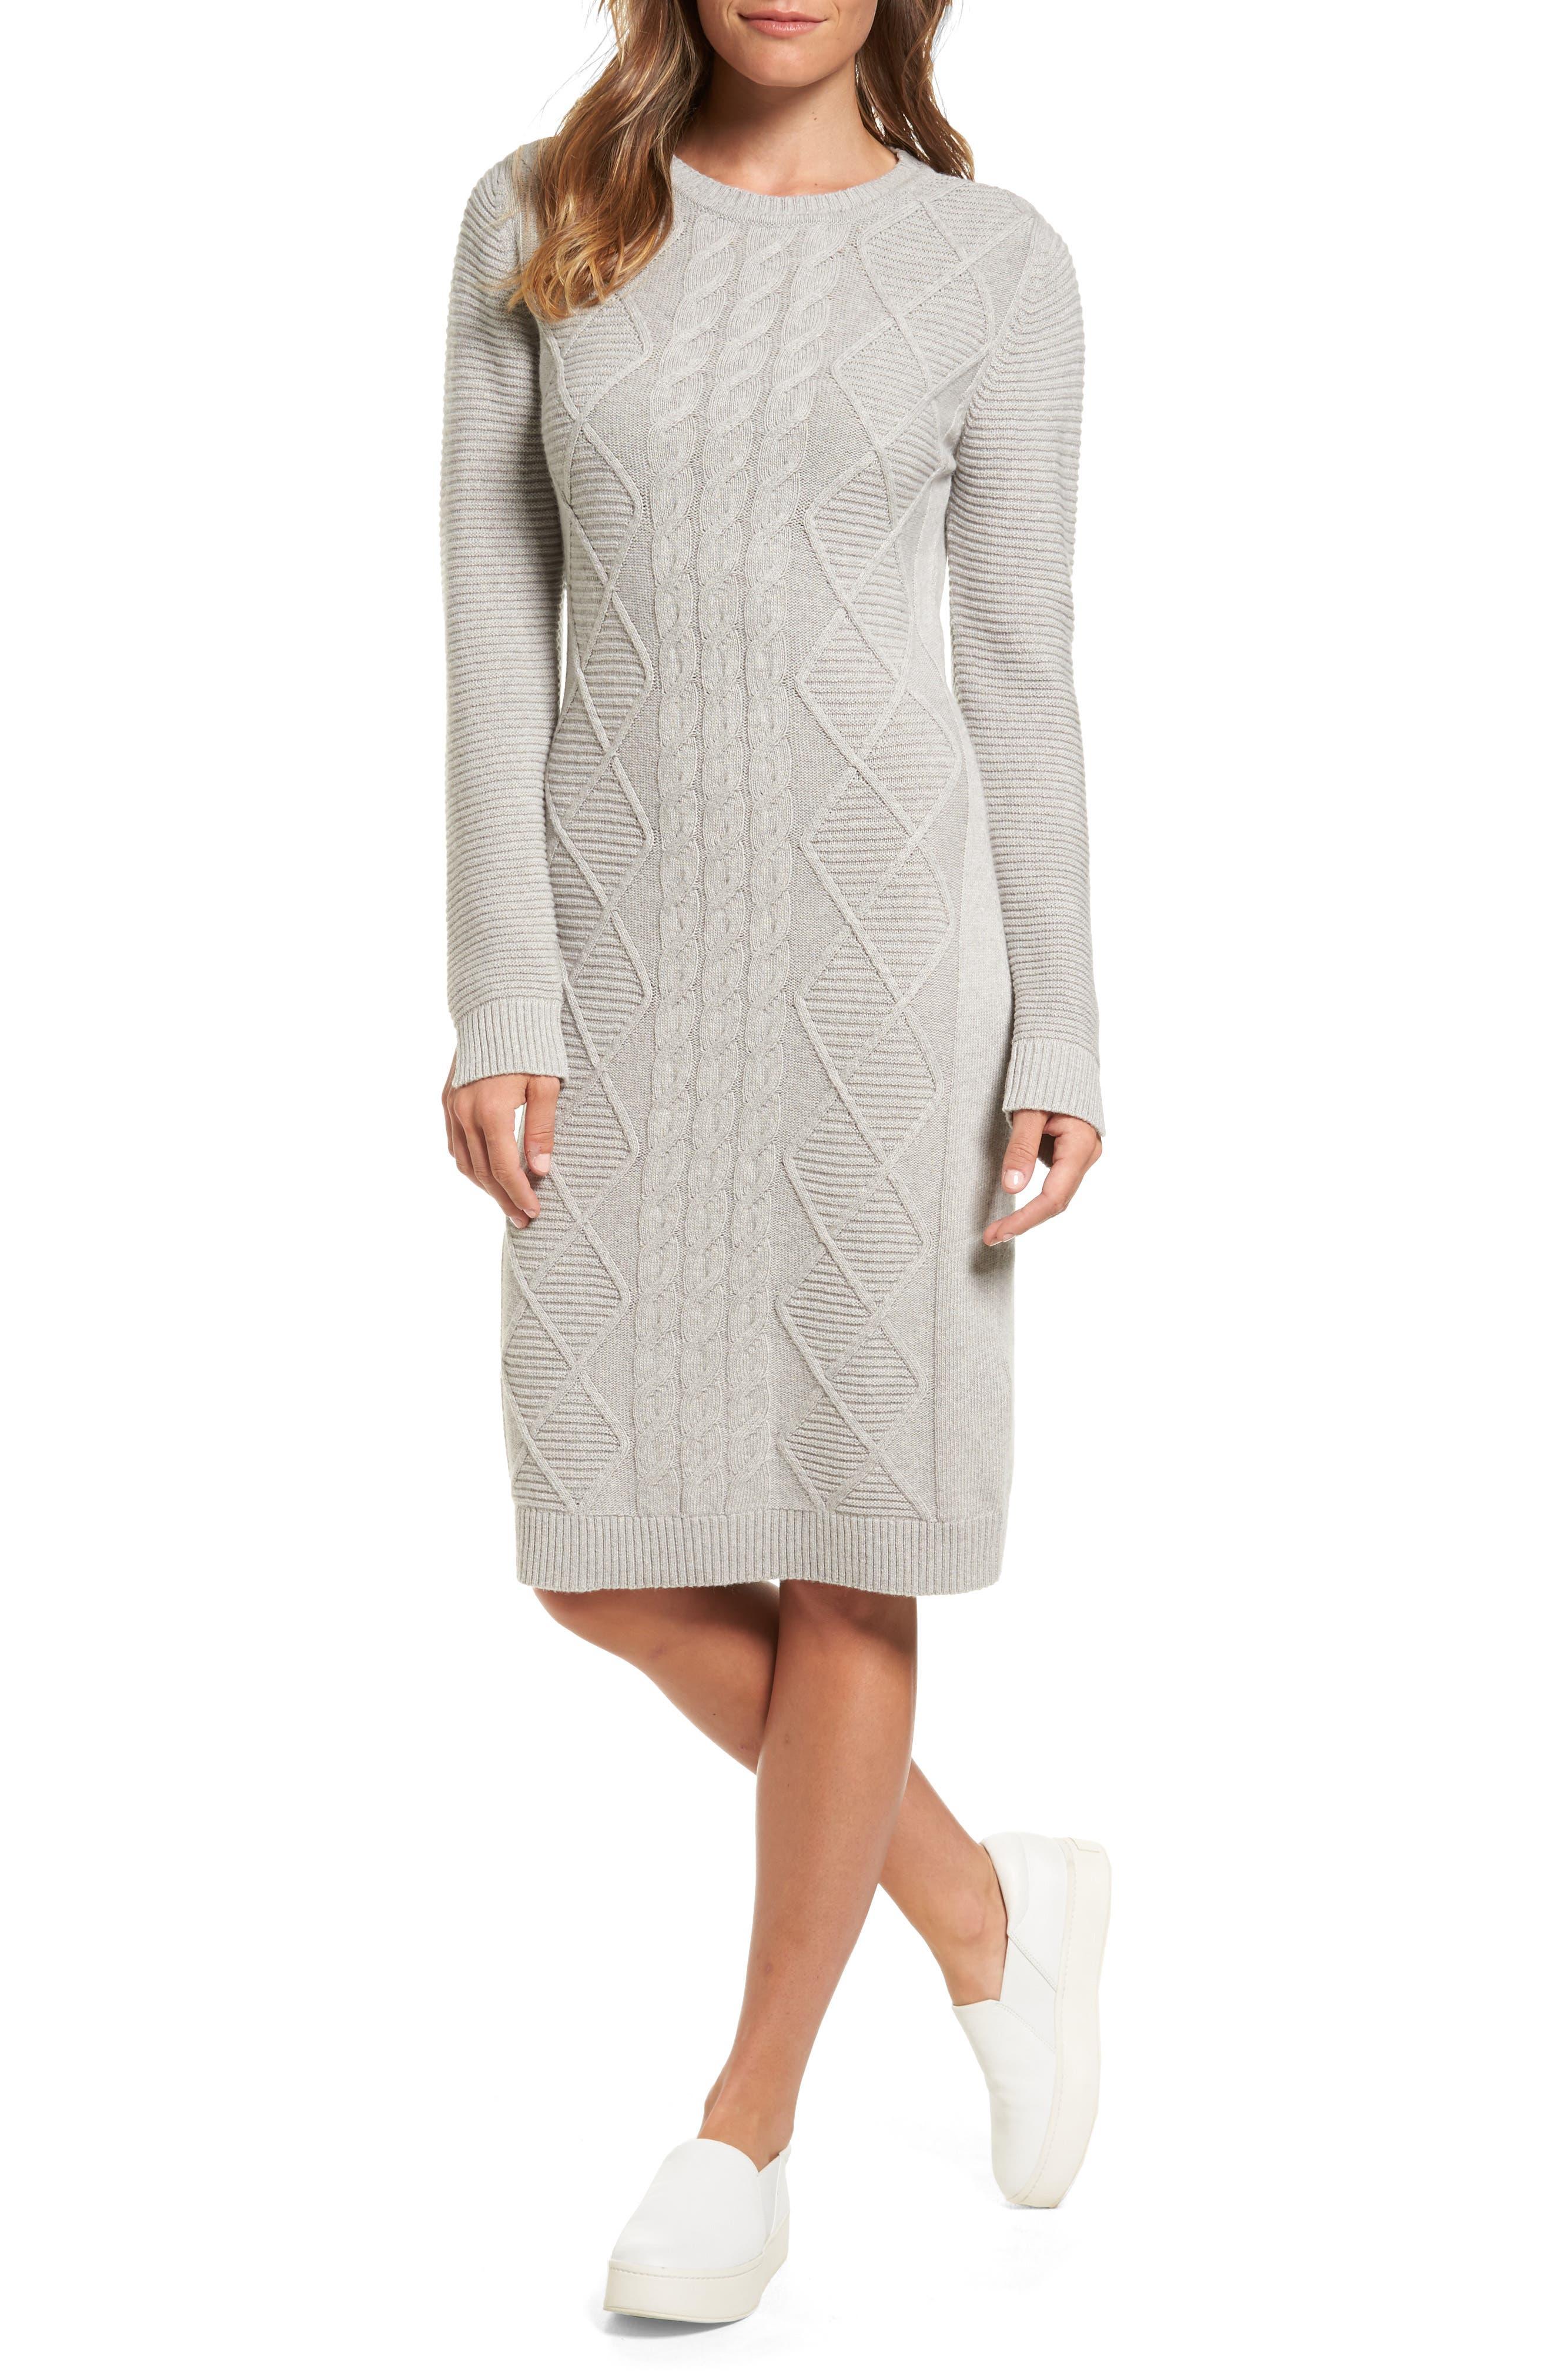 Emmanuel Cable Knit Sweater Dress,                             Main thumbnail 1, color,                             050